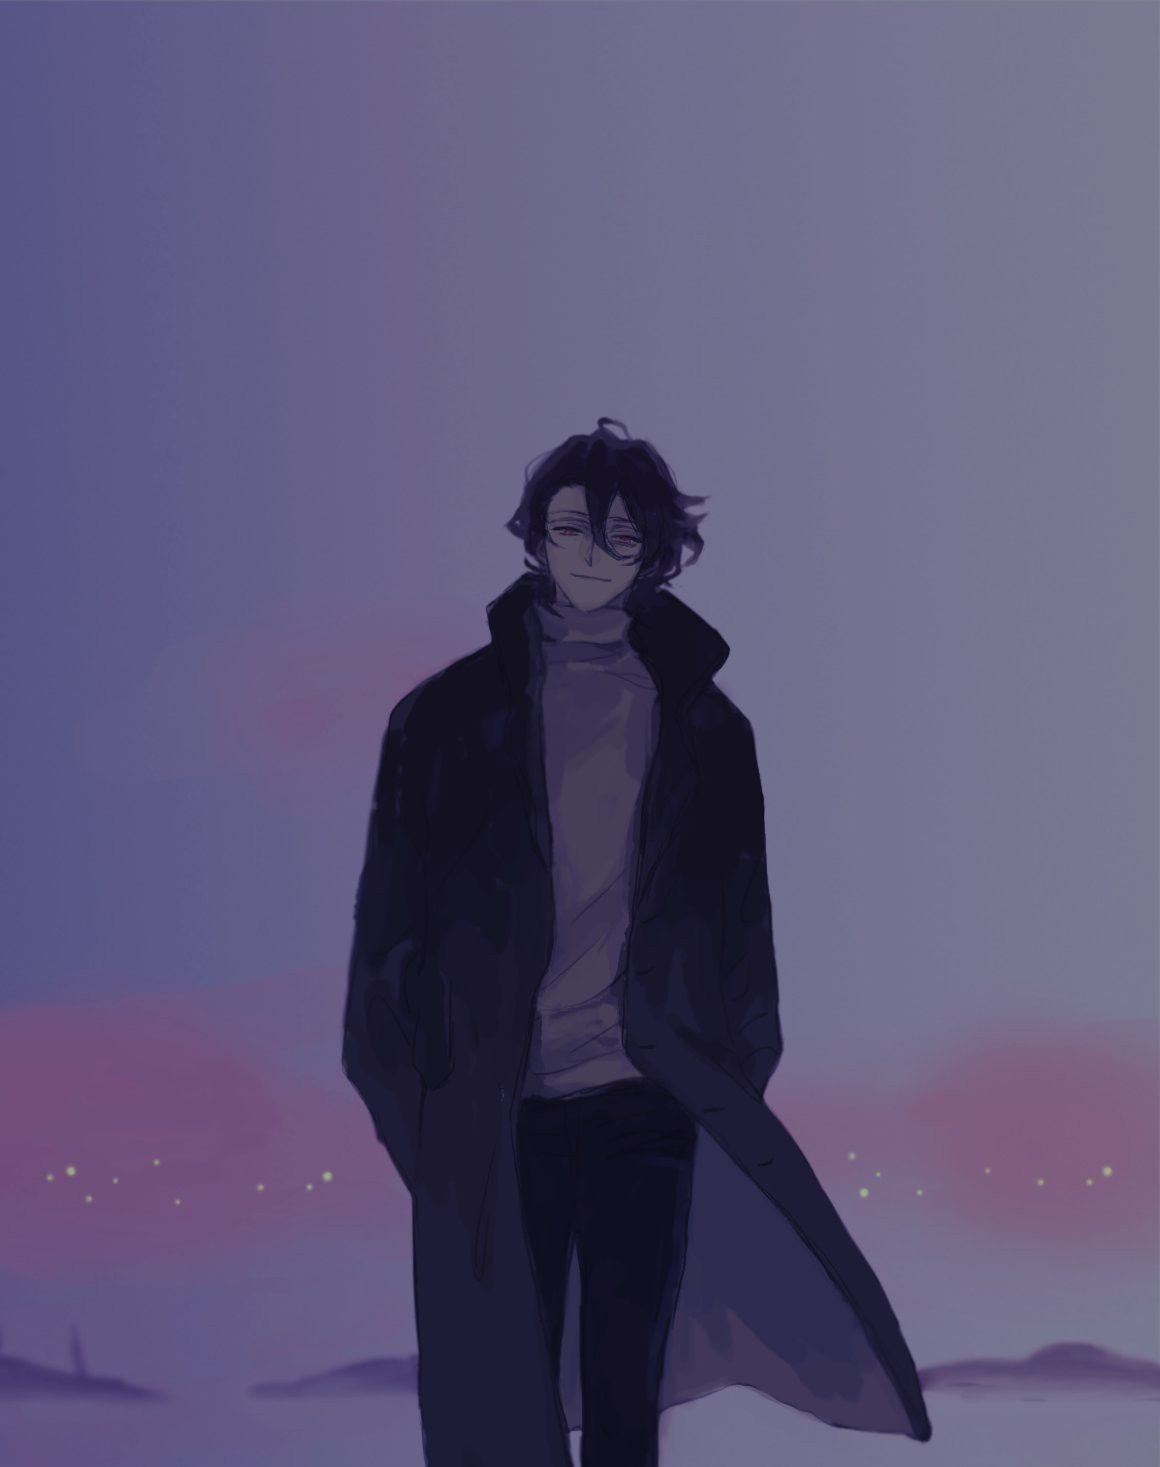 Pin By Ayra On Anime Art Cute Anime Guys Handsome Anime Guys Handsome Anime